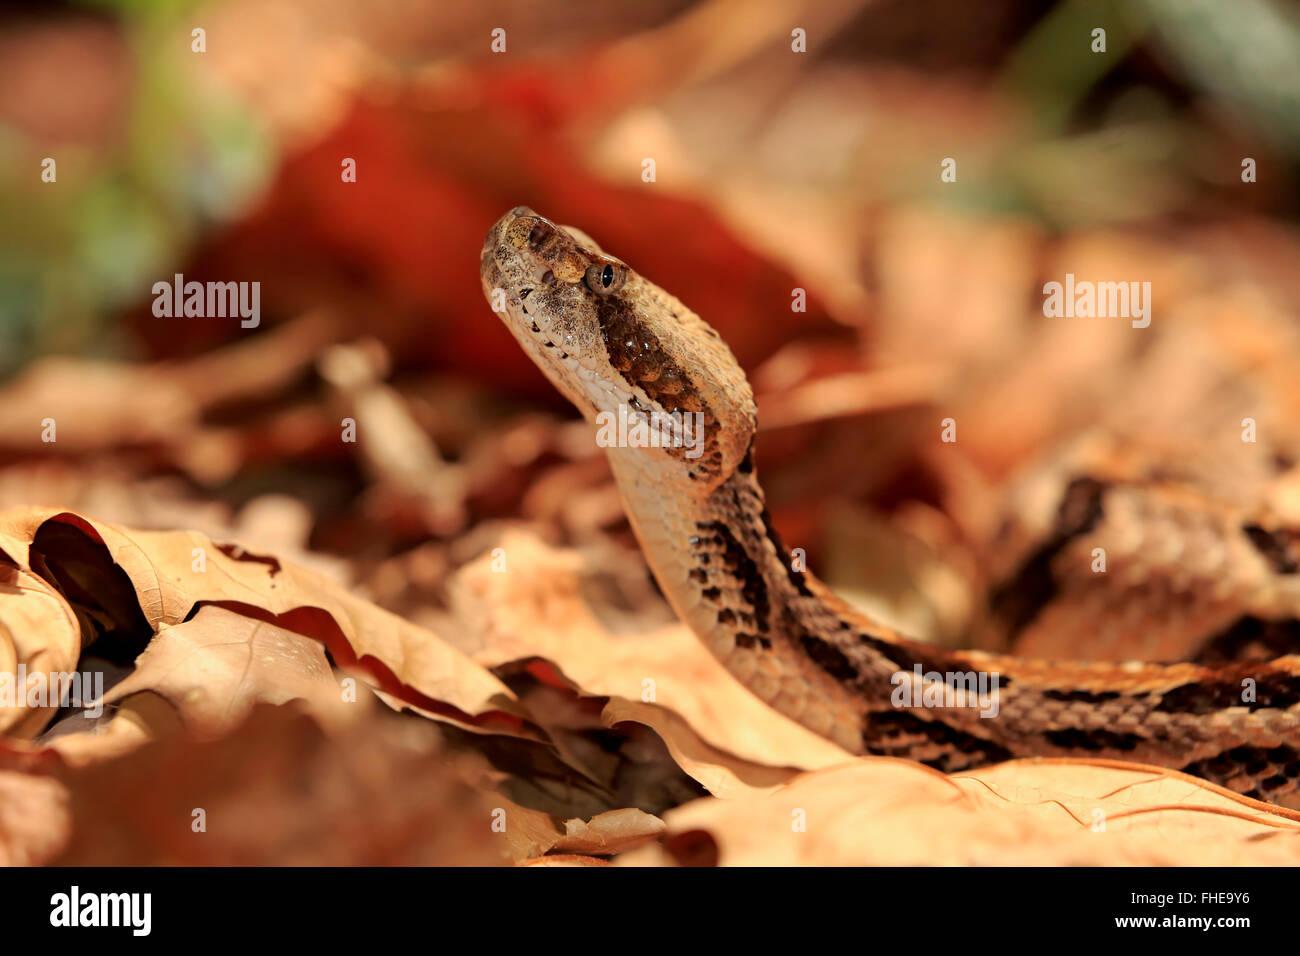 Timber Rattlesnake, adult, USA, Northamerica / (Crotalus horridus) - Stock Image